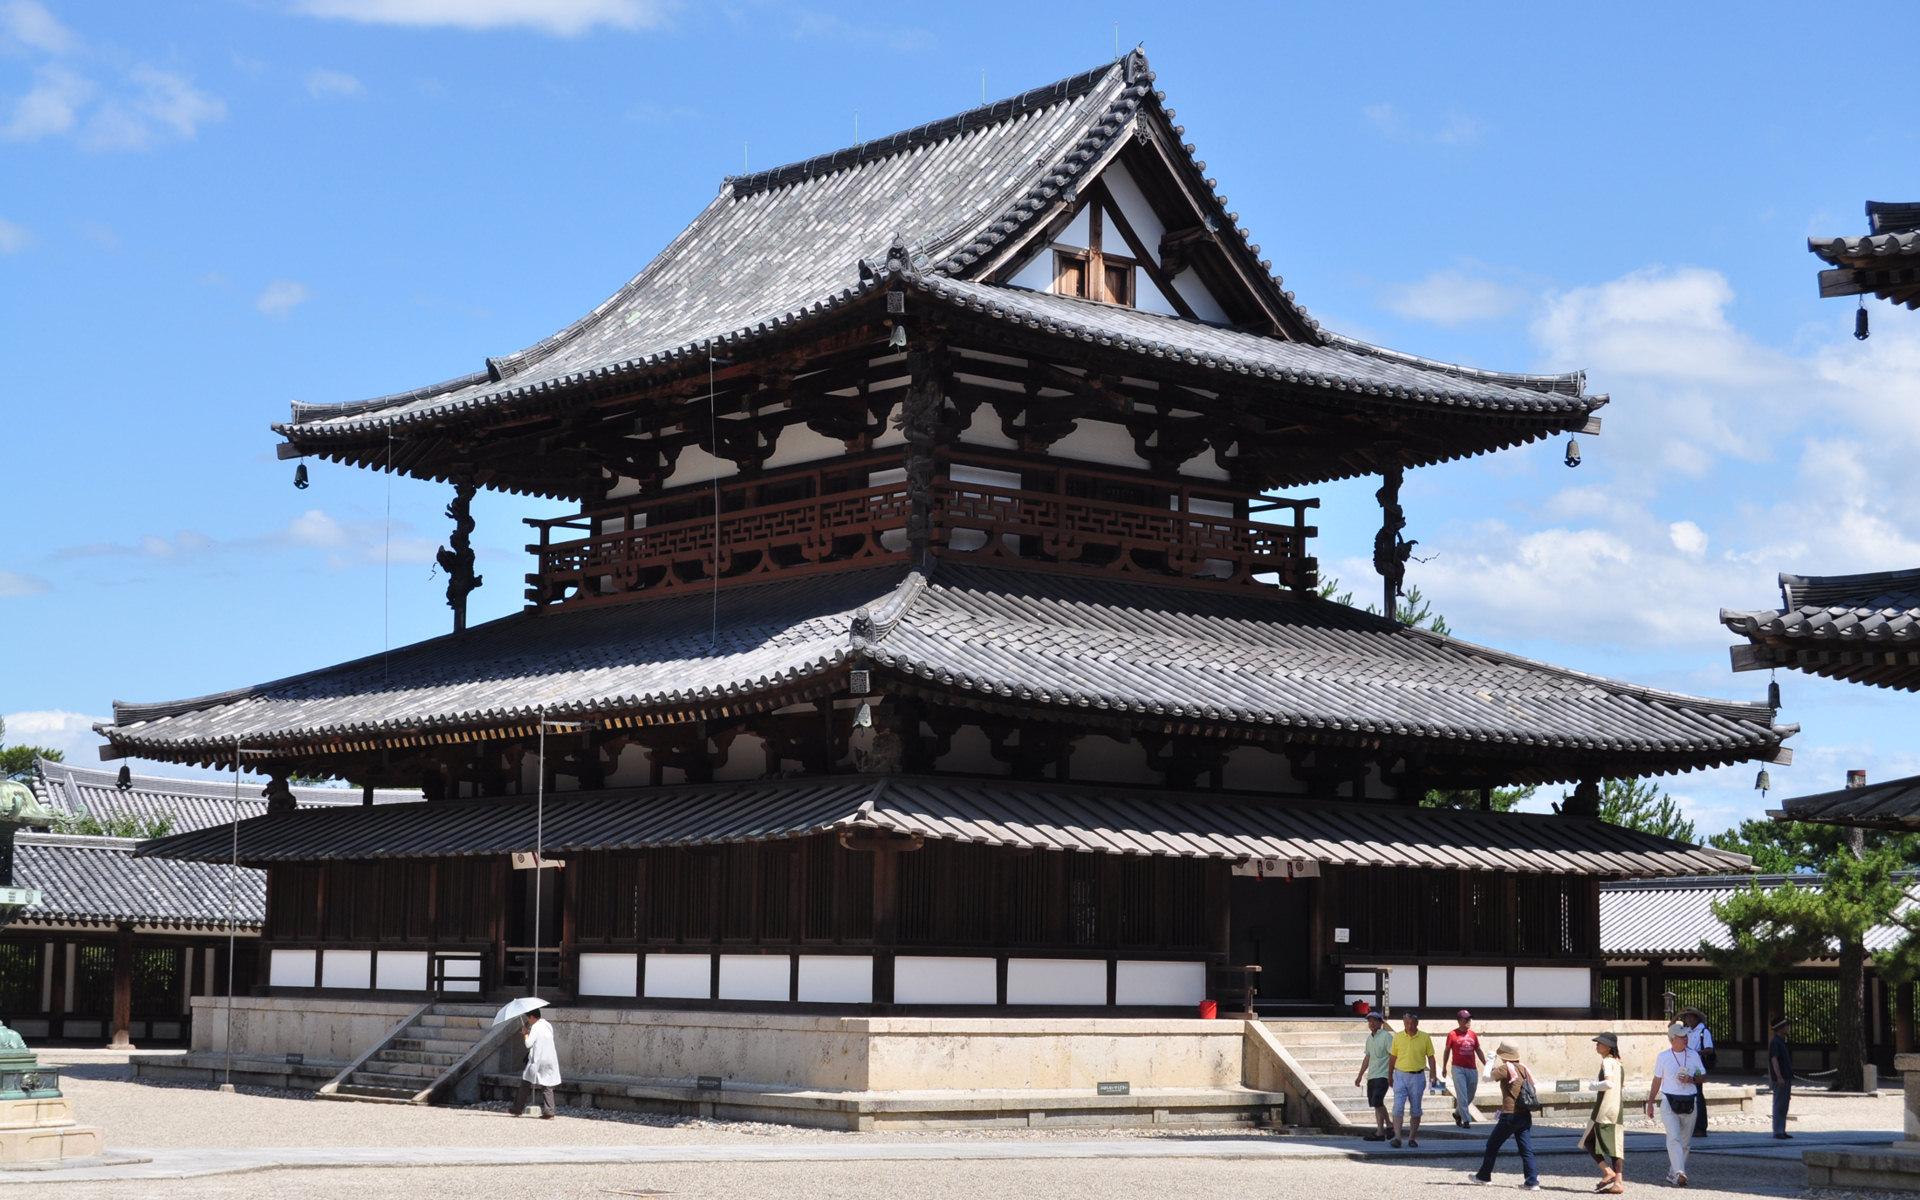 2020年 4月『法隆寺地域の仏教建造物群』